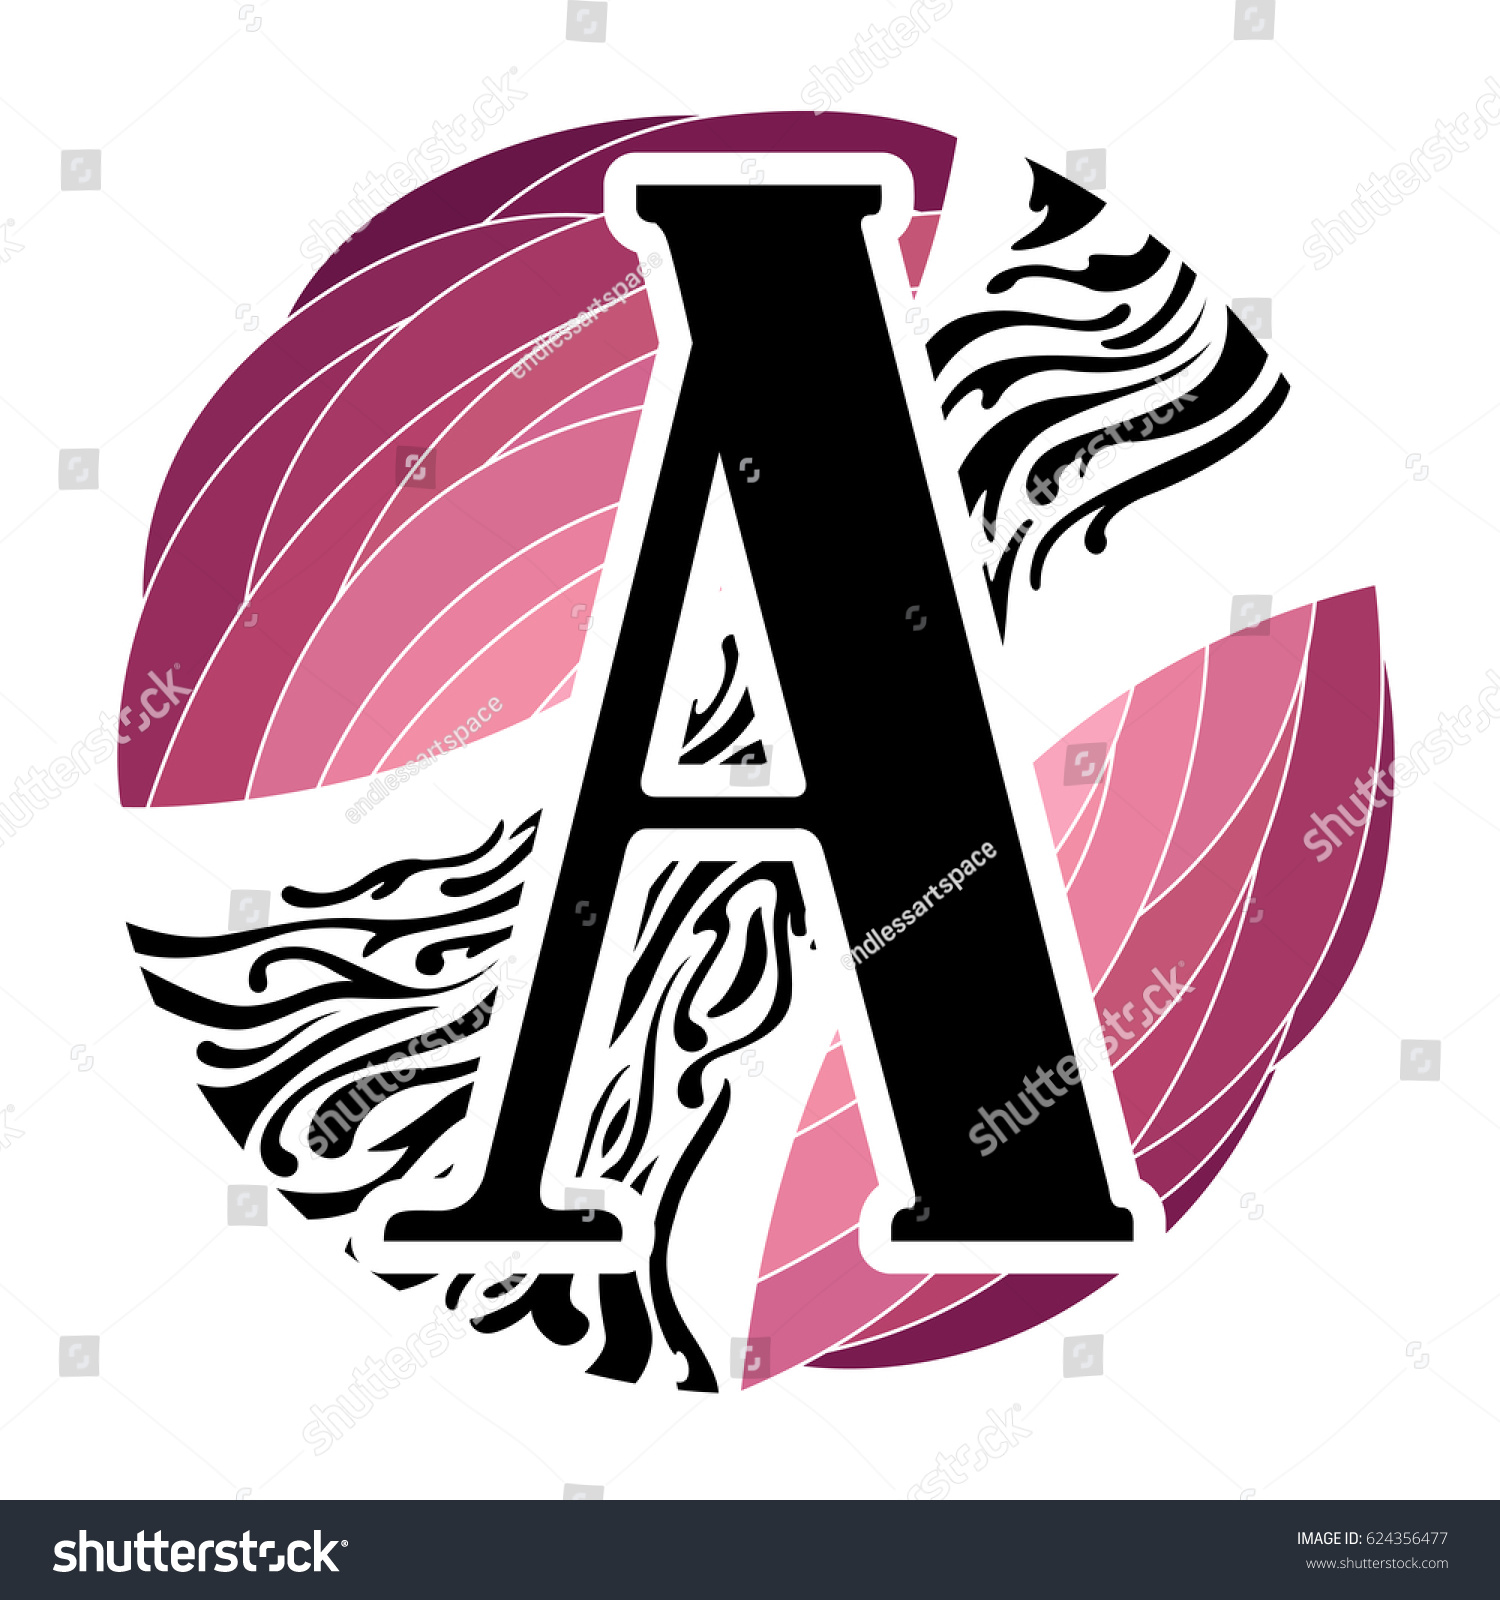 Single Letter Ticker Symbols 100 Images Single L Alphabet